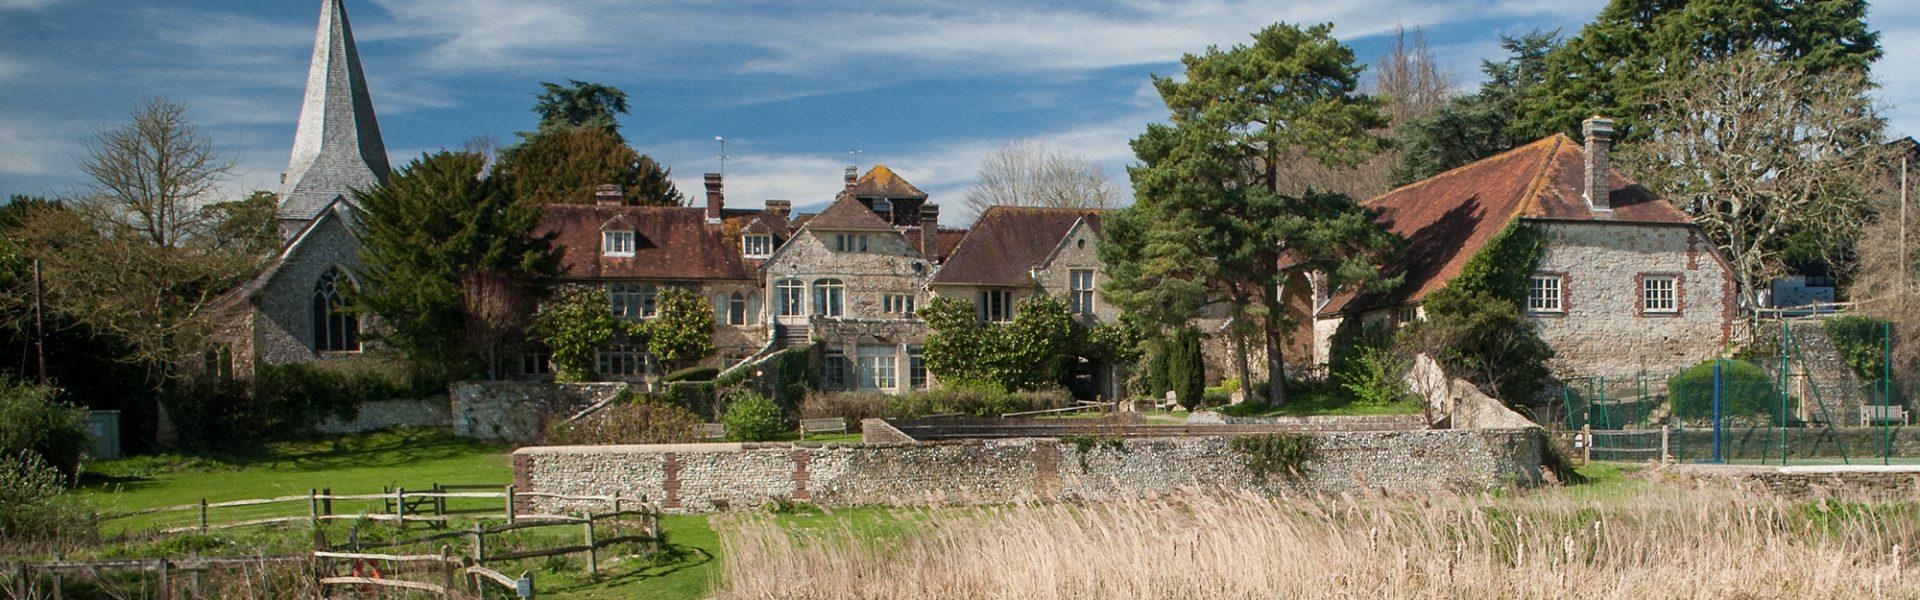 Bury West Sussex